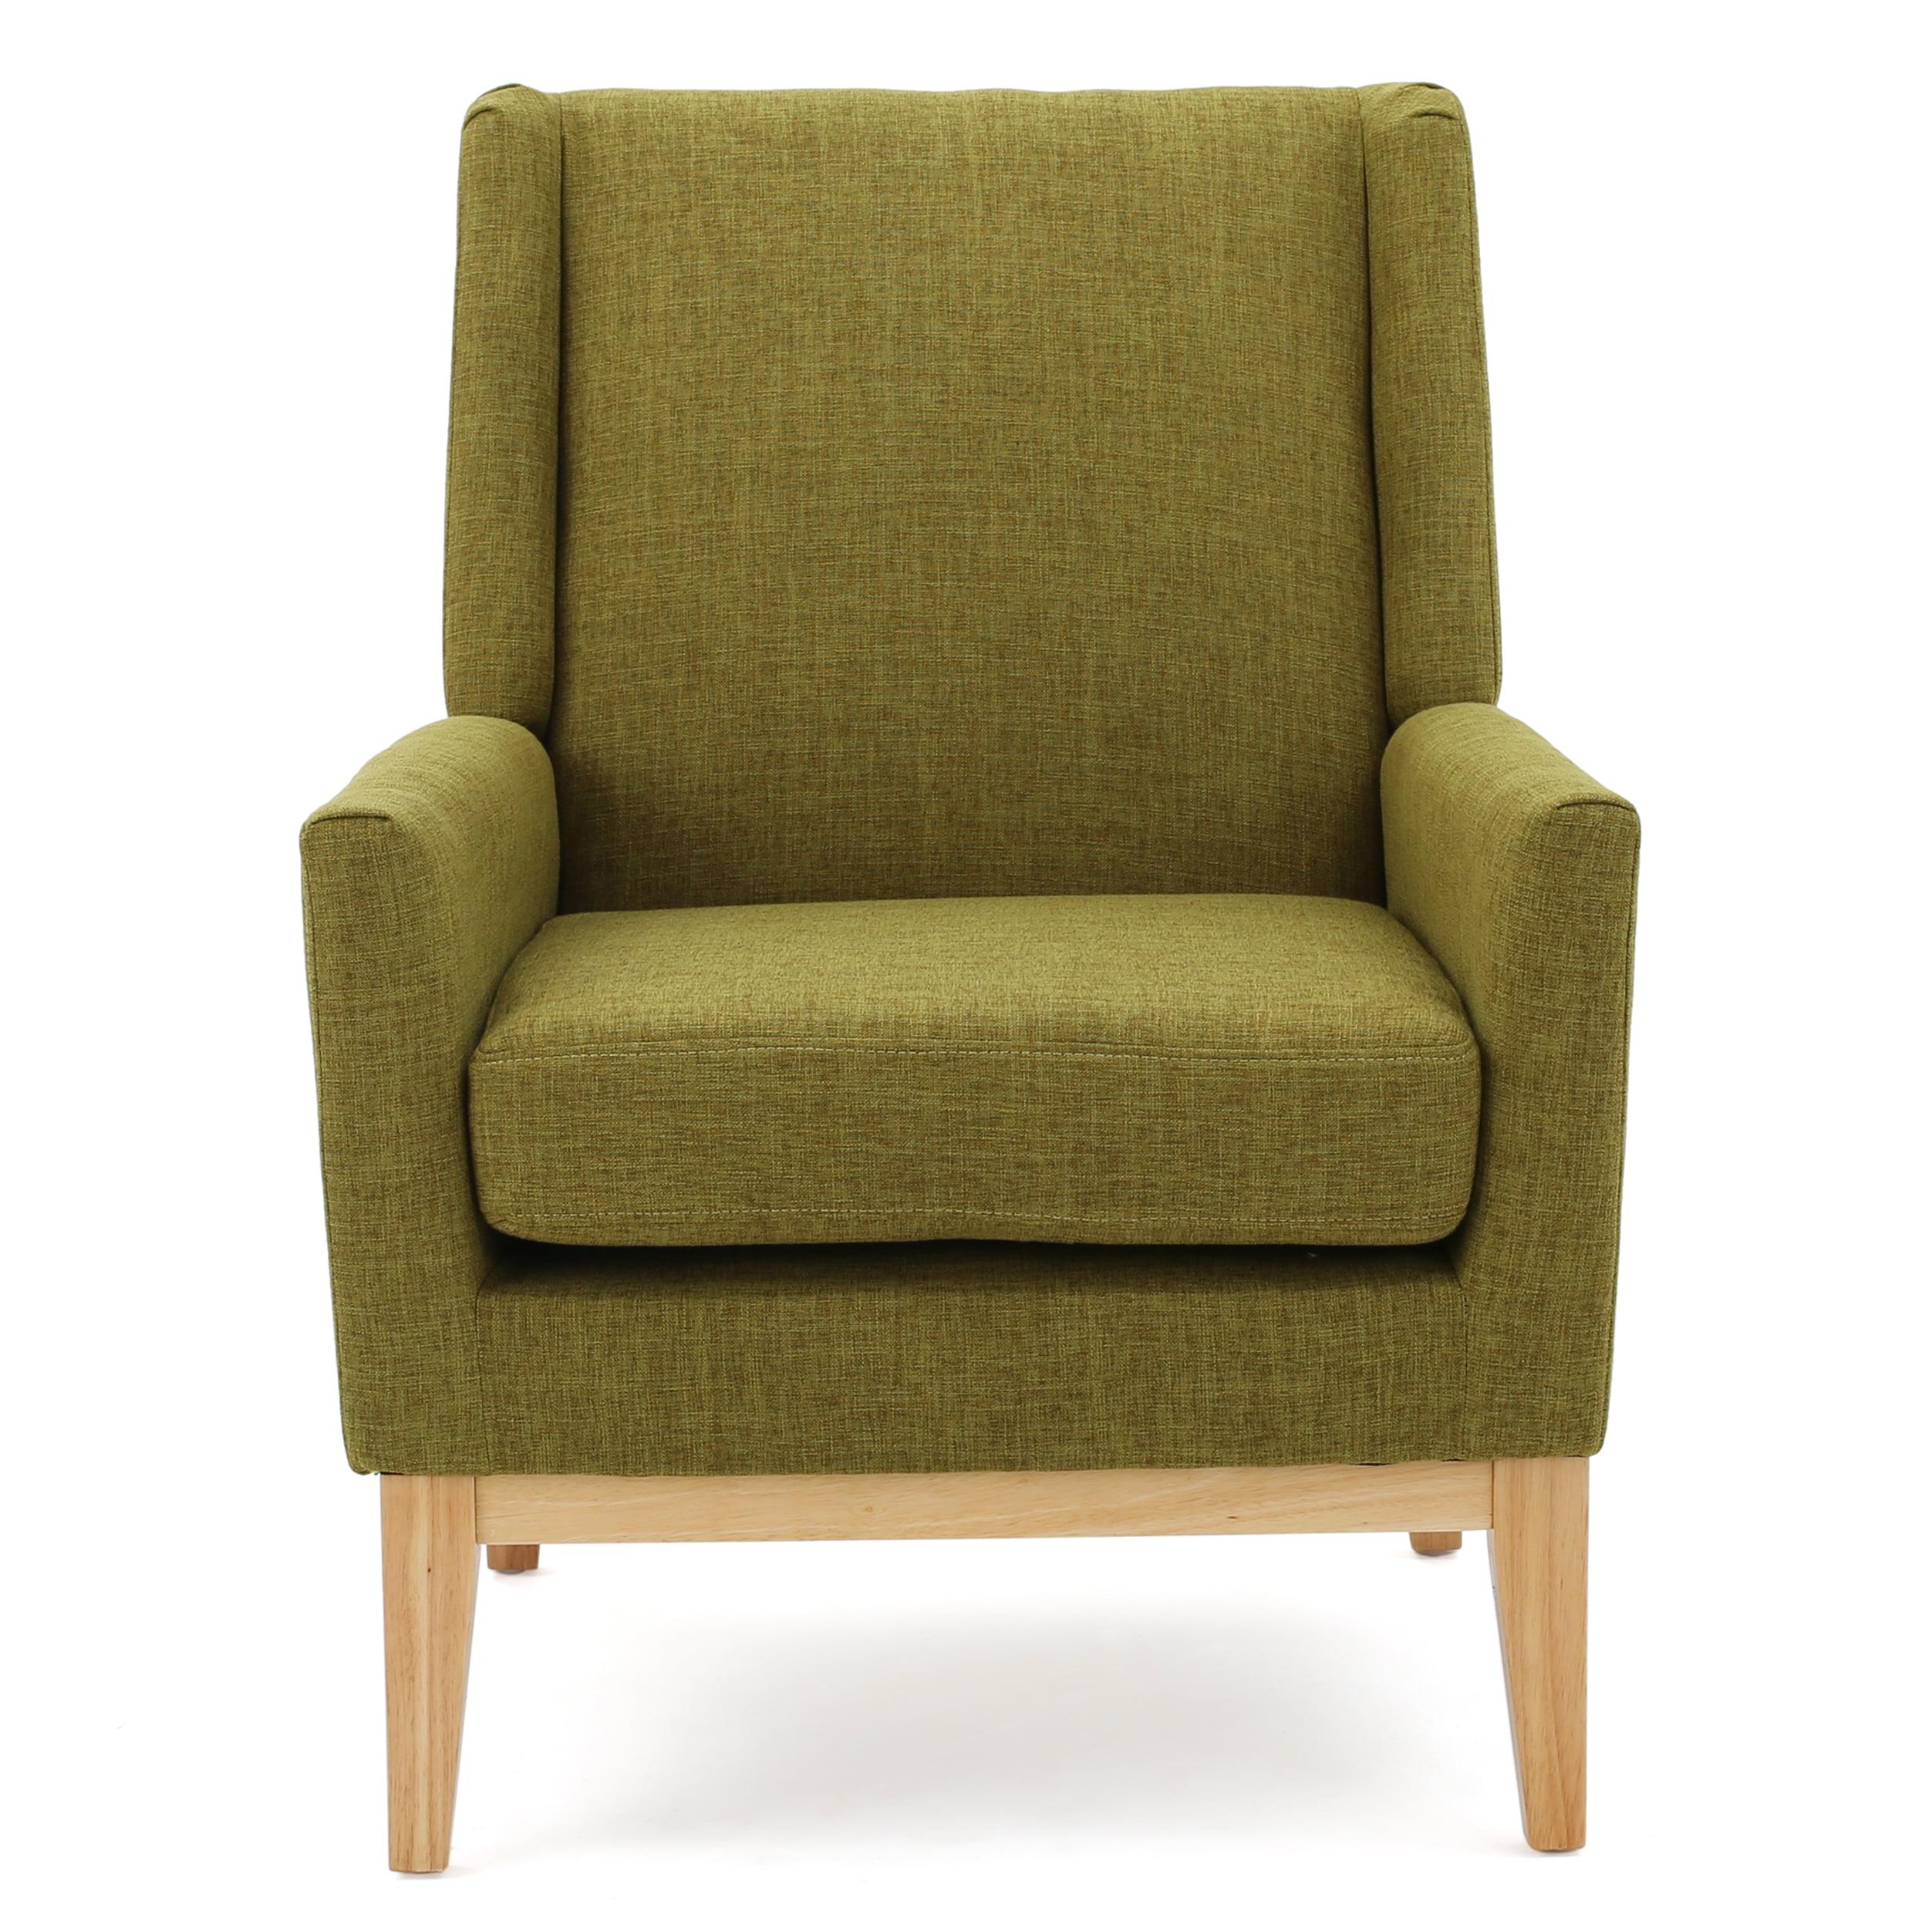 Archibald Mid Century Modern Fabric Accent Chair, Green